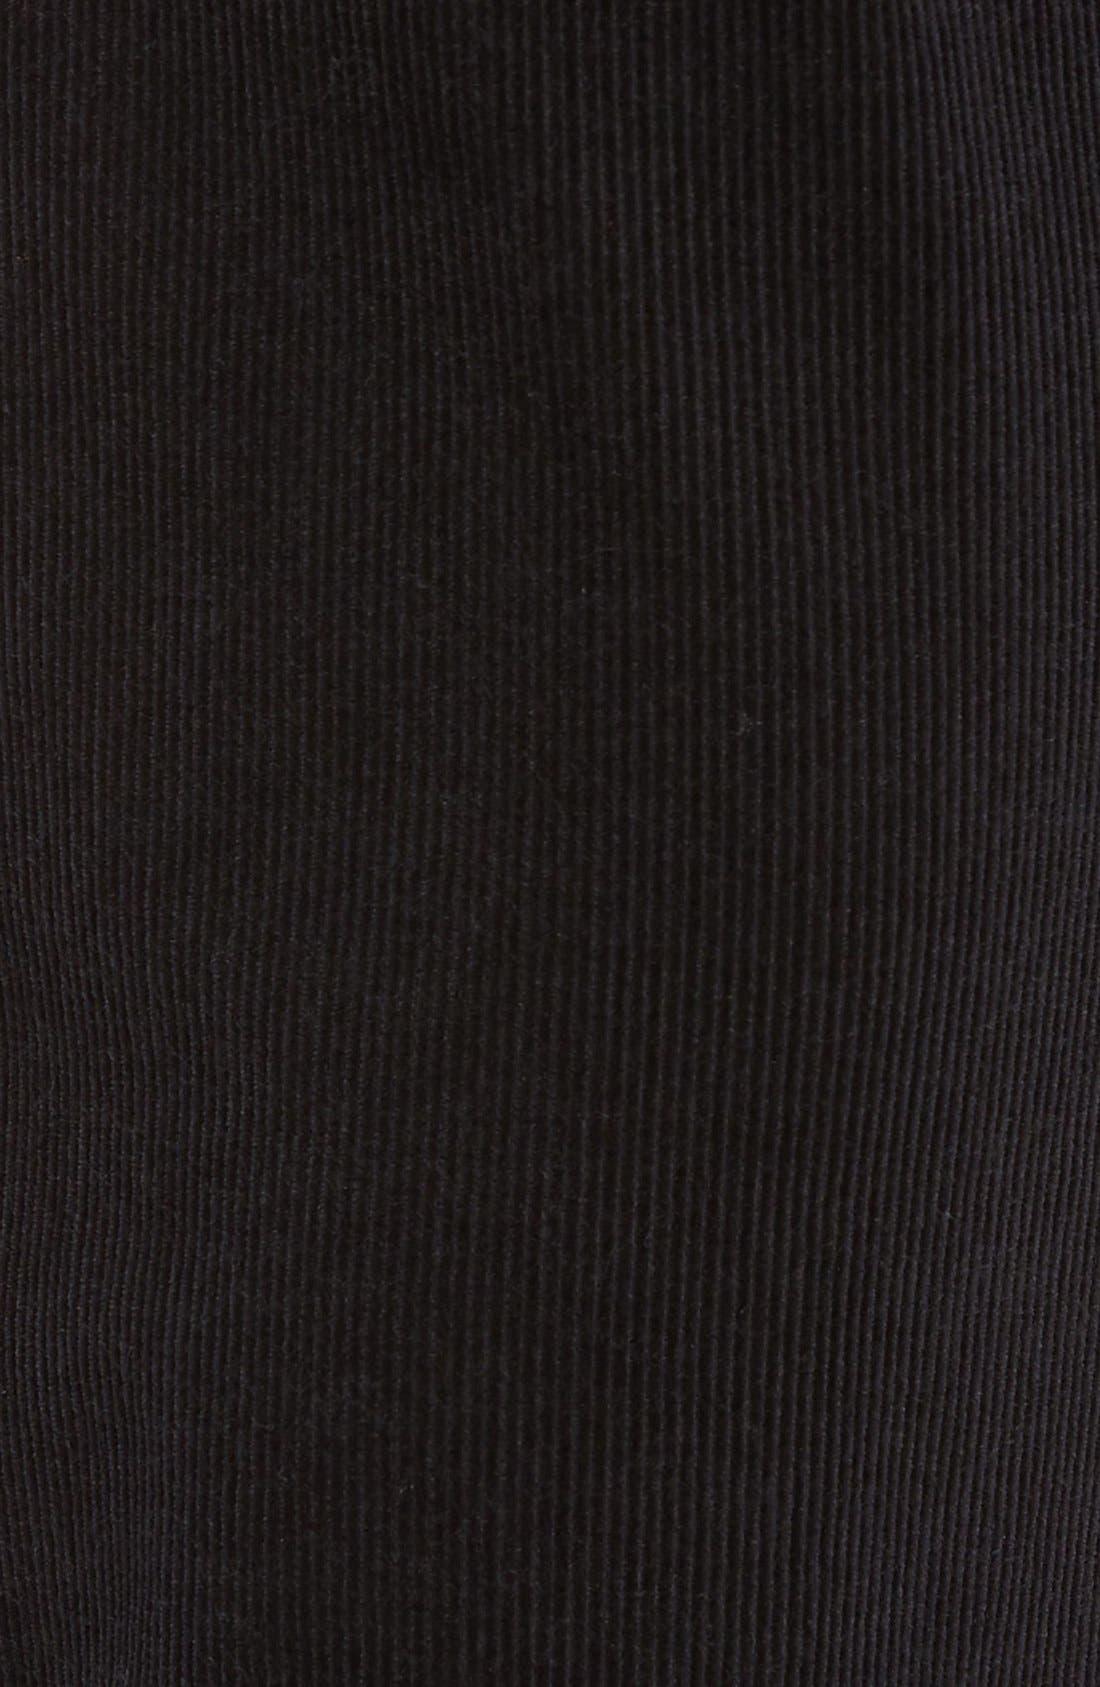 Greenwood Stretch Corduroy Pants,                             Alternate thumbnail 6, color,                             001